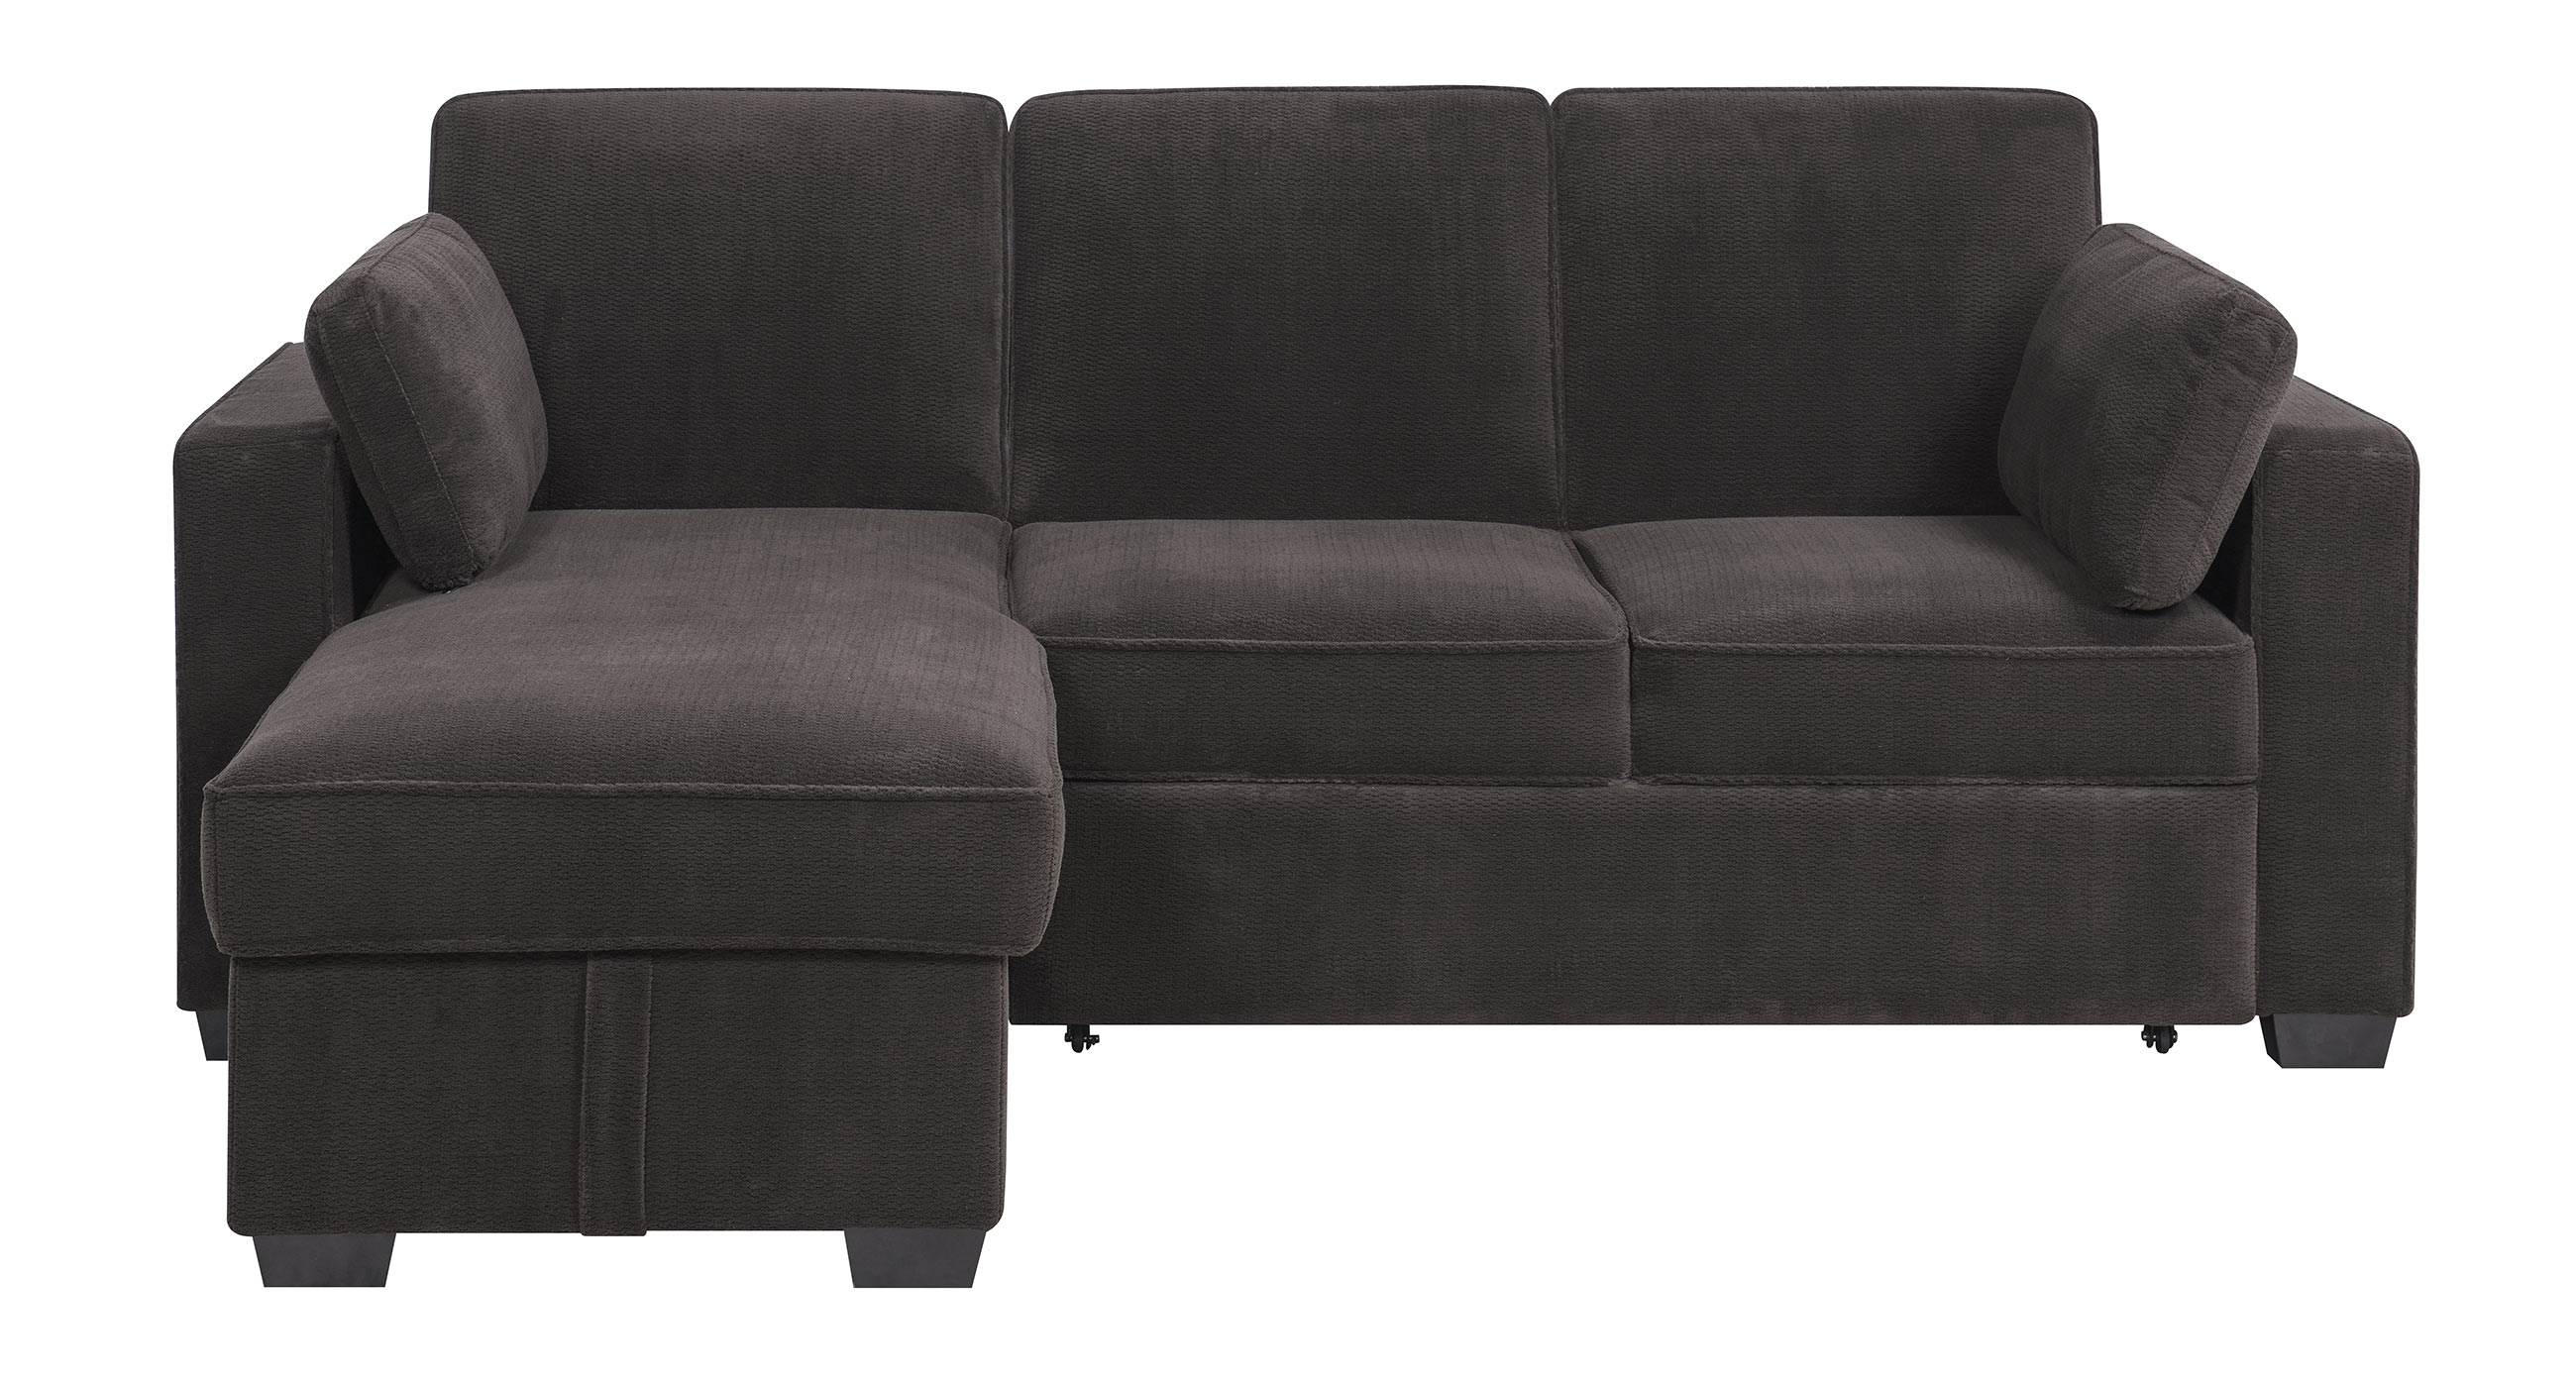 Chaela Sectional Convertible Sofa Dark Grey by Serta Lifestyle